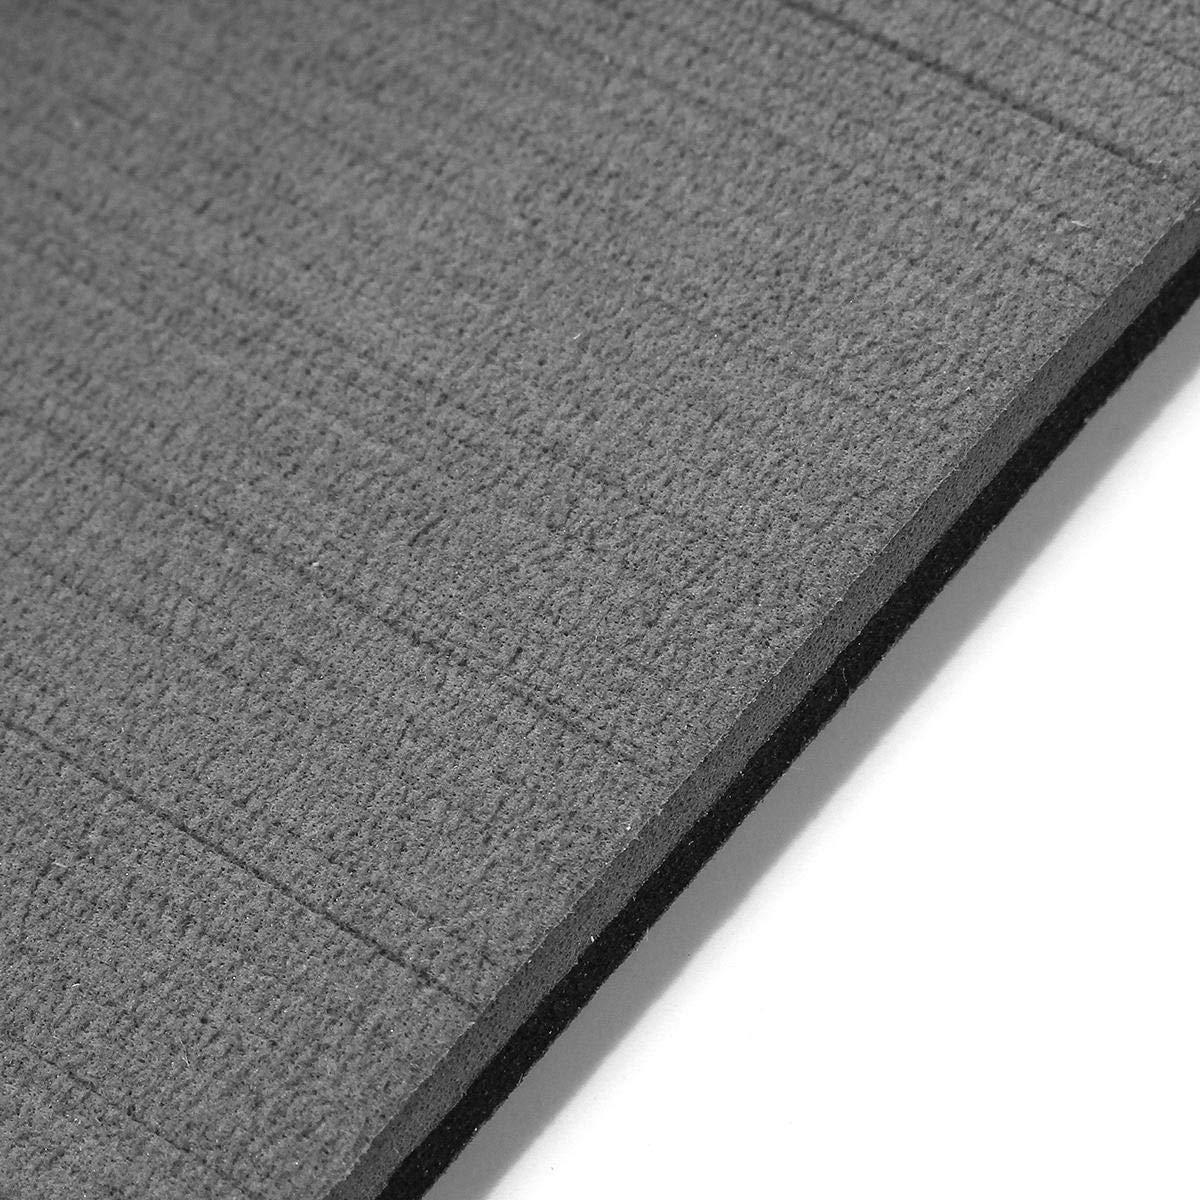 Barco Plataforma Hoja 2400x450x6mm gris marina Suelos imitaci/ón de teca espuma de EVA Alfombra del piso